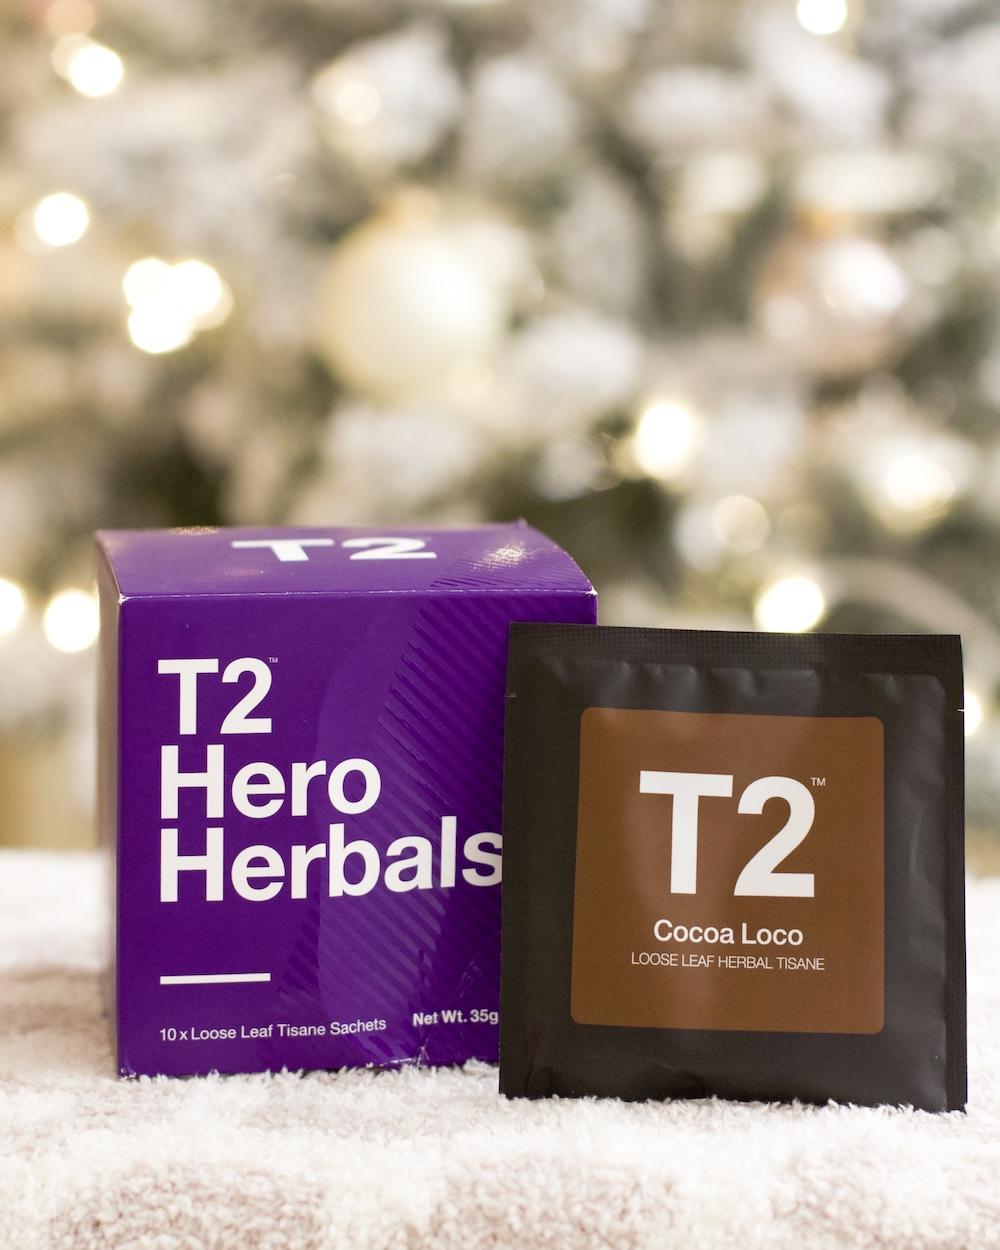 t2 brea mall herbal tea